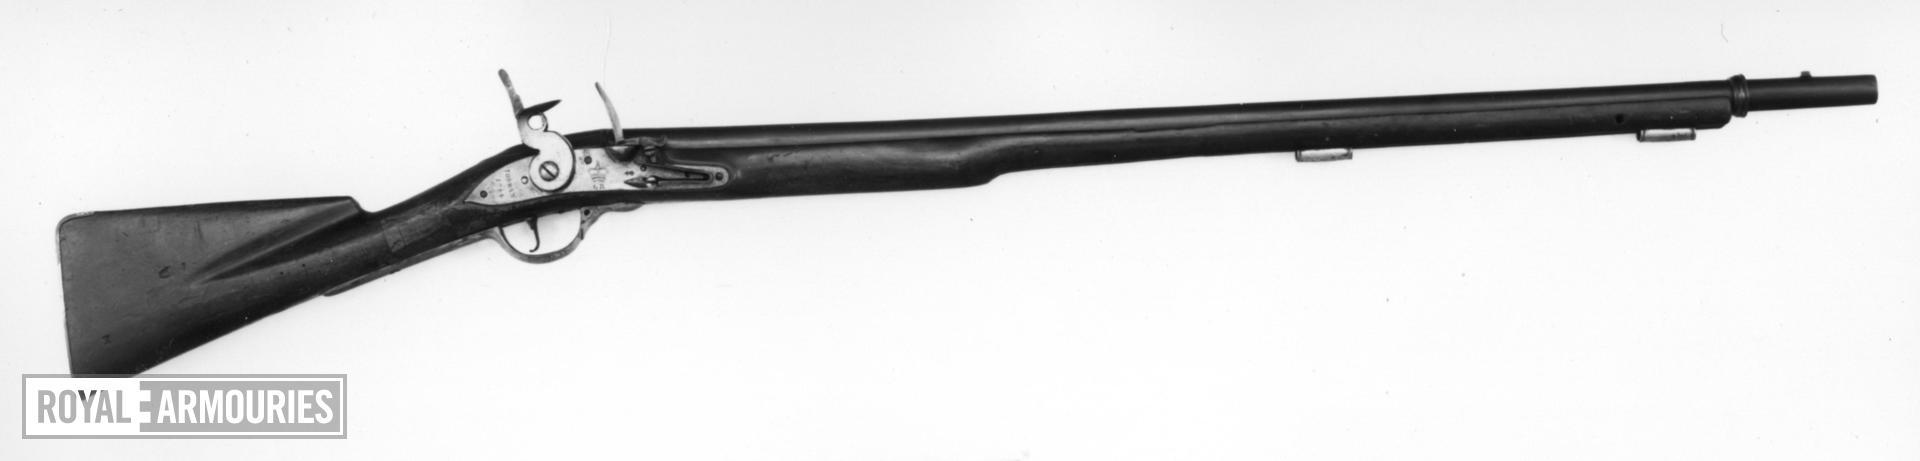 Flintlock muzzle-loading military musket - Pattern 1738 Black (Short) Sea Service